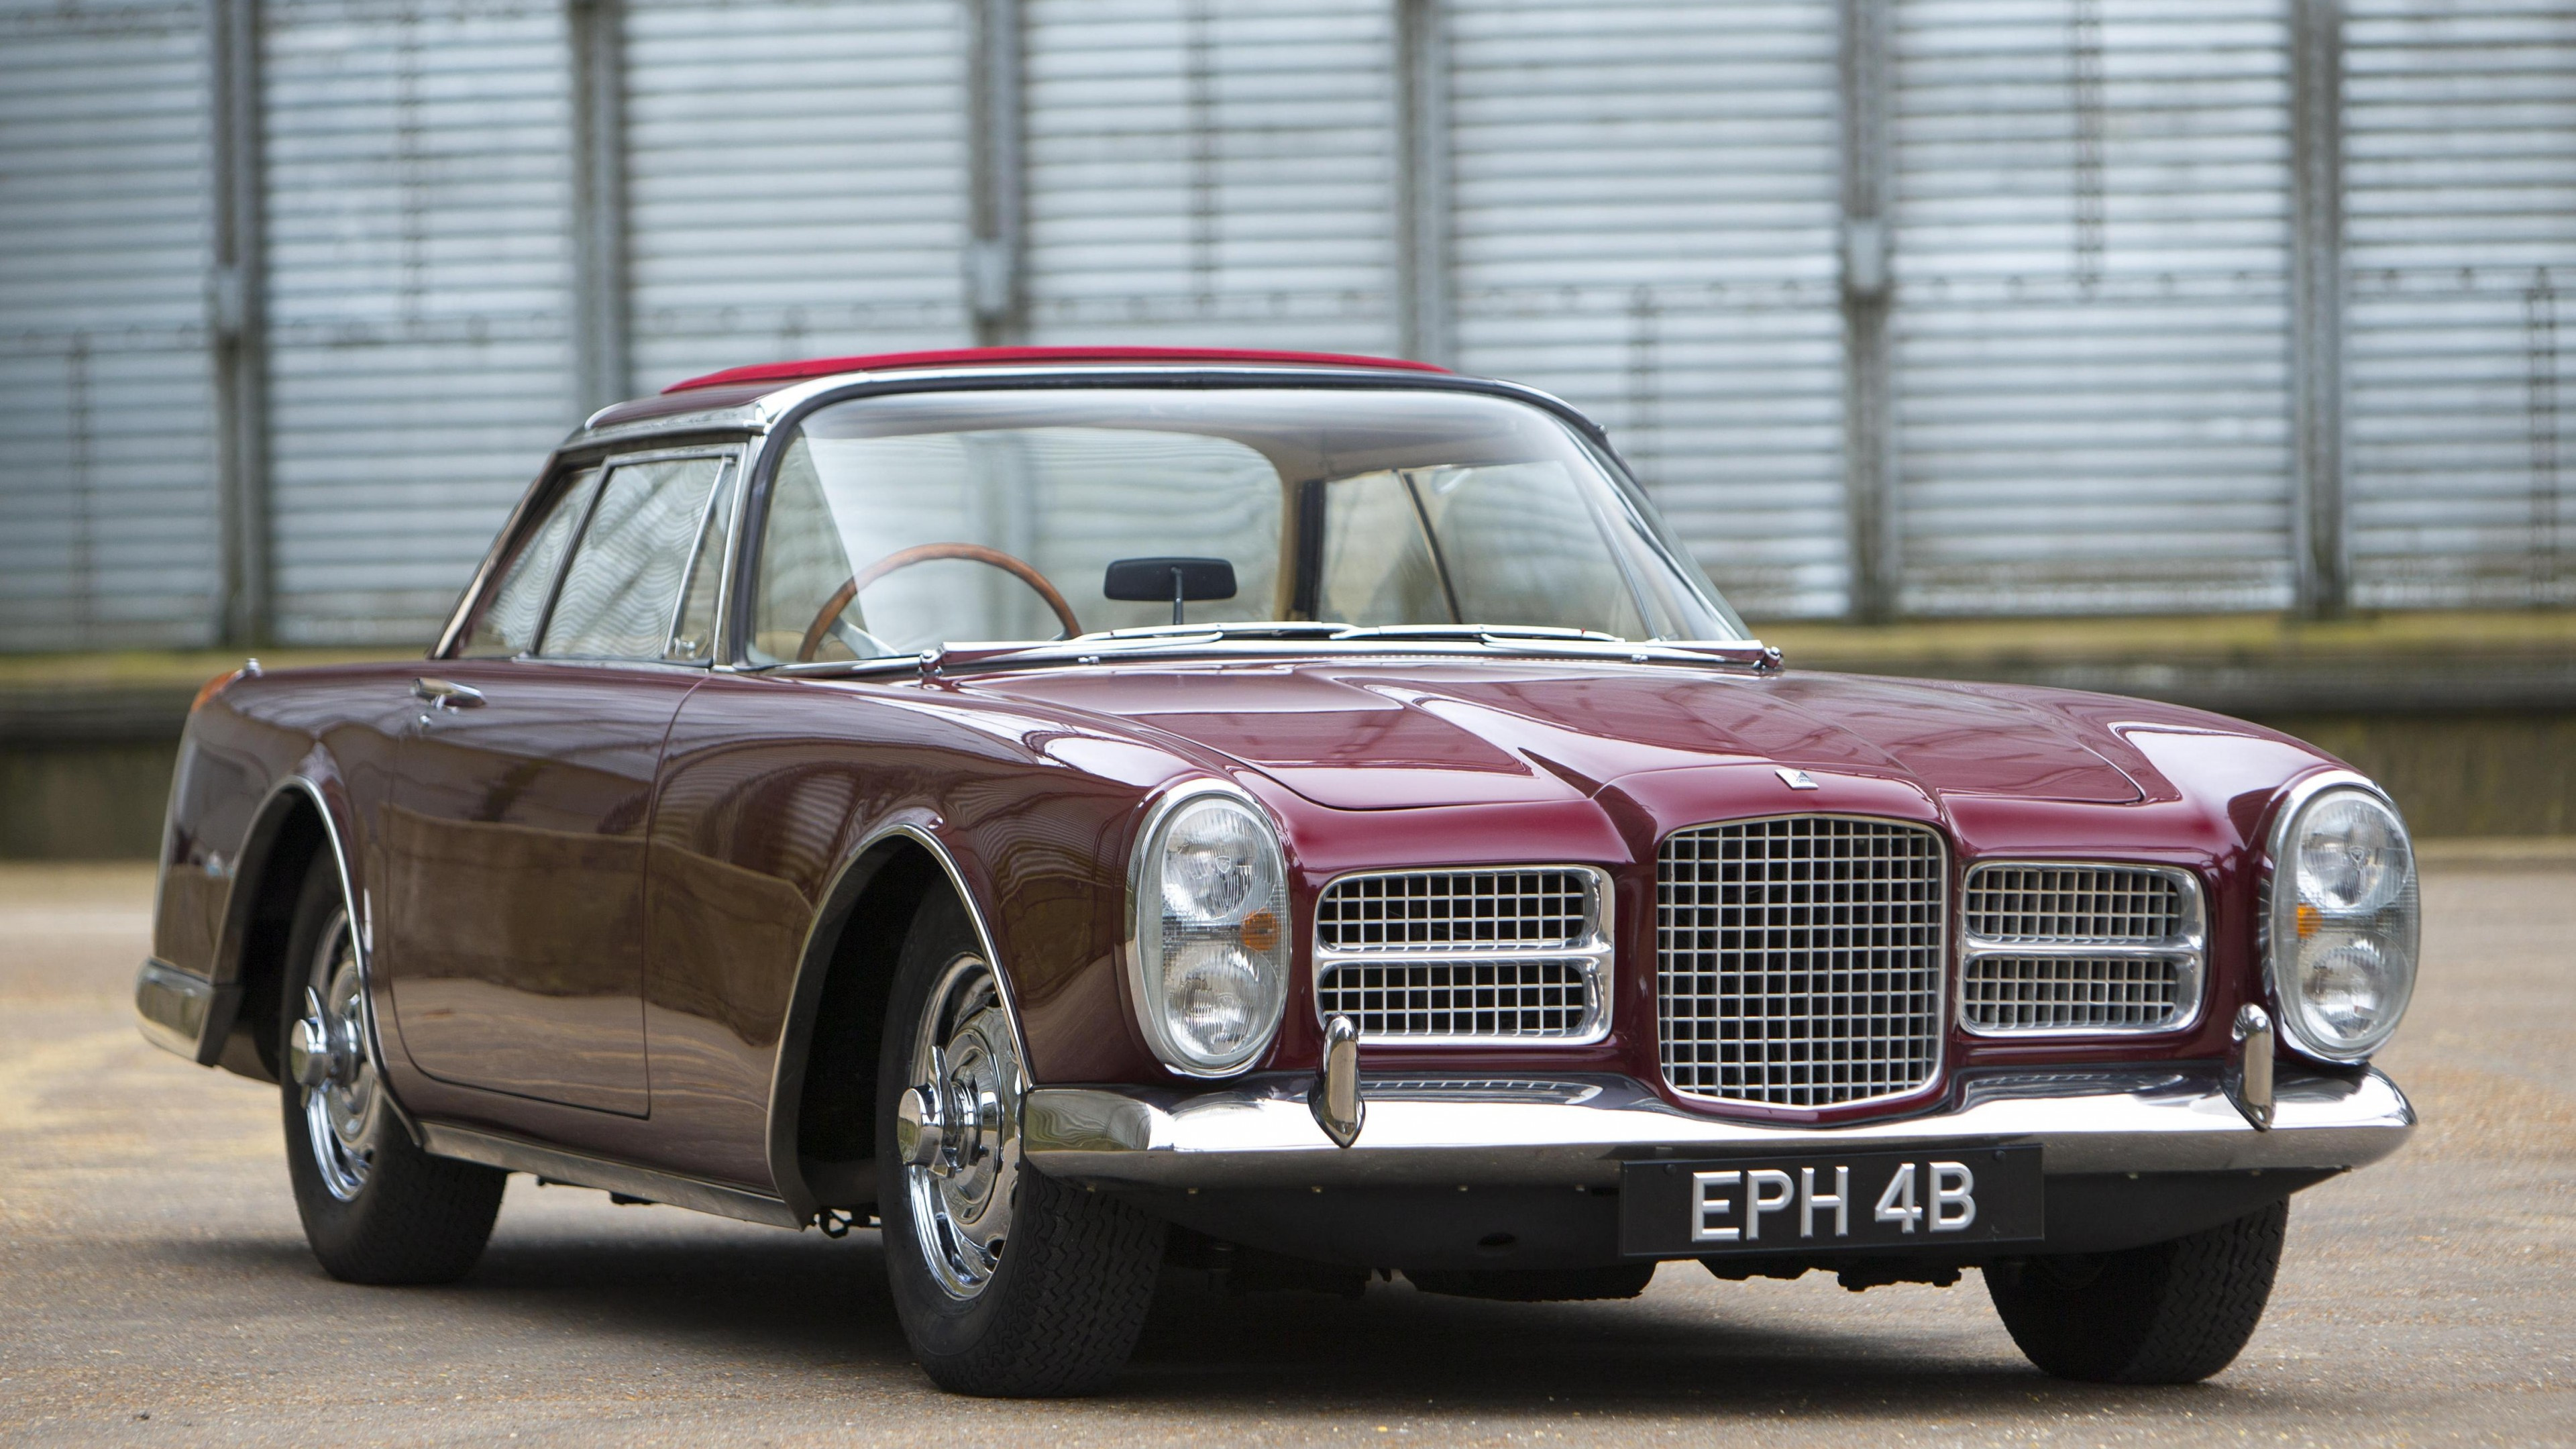 Nissan Luxury Brand >> Wallpaper Facel Vega, Facellia, III, 3, classic cars, sports car, front, rent, buy, HK500, FVS ...